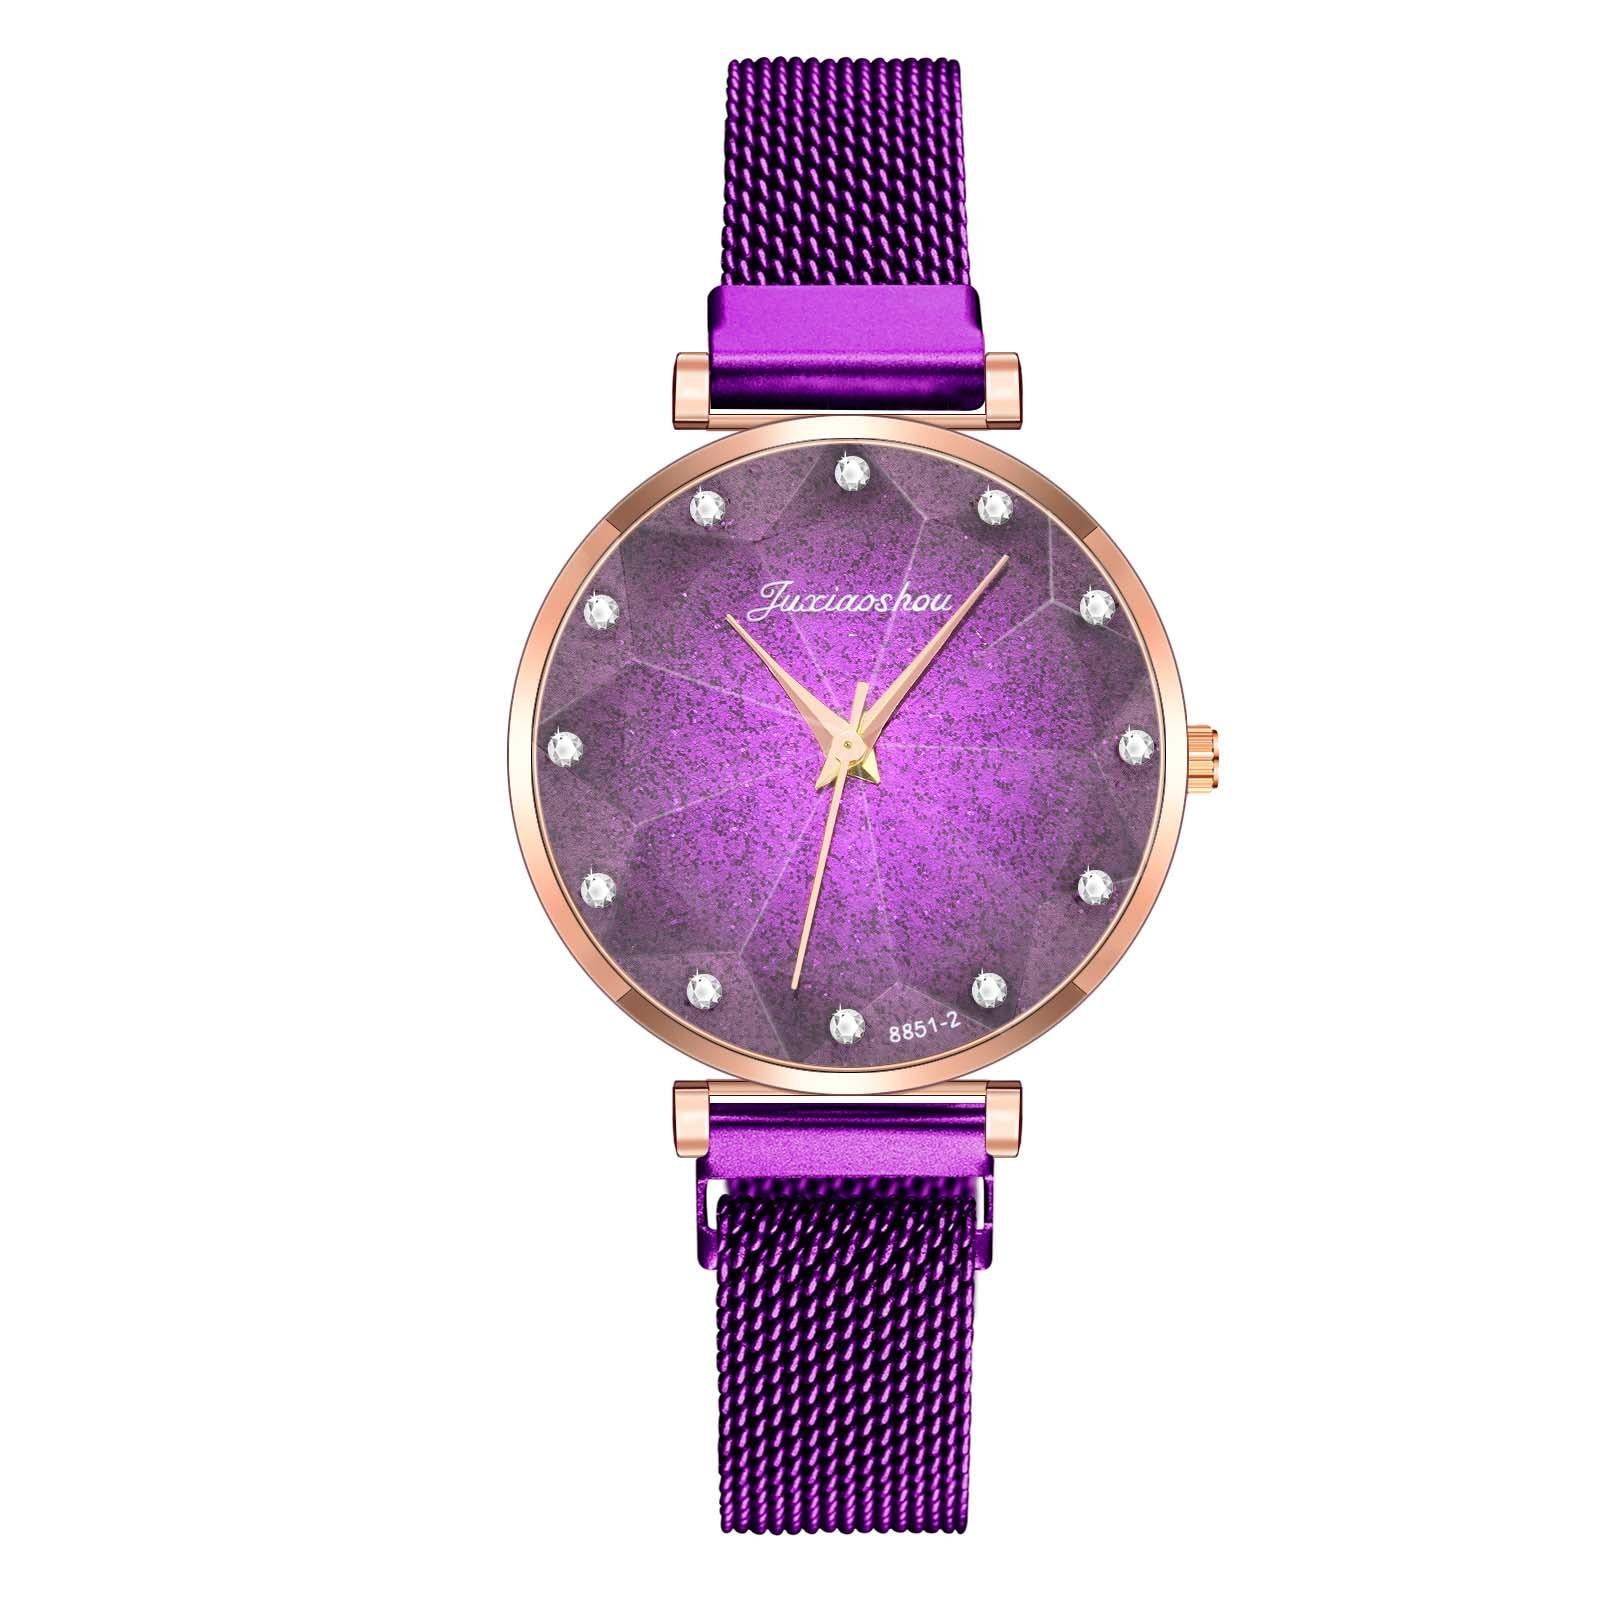 Fashion Women Watches Luxury Quartz Clock Stainless Steel Strap Starry Sky Dial Casual Wristwatch женские часы недорого W1